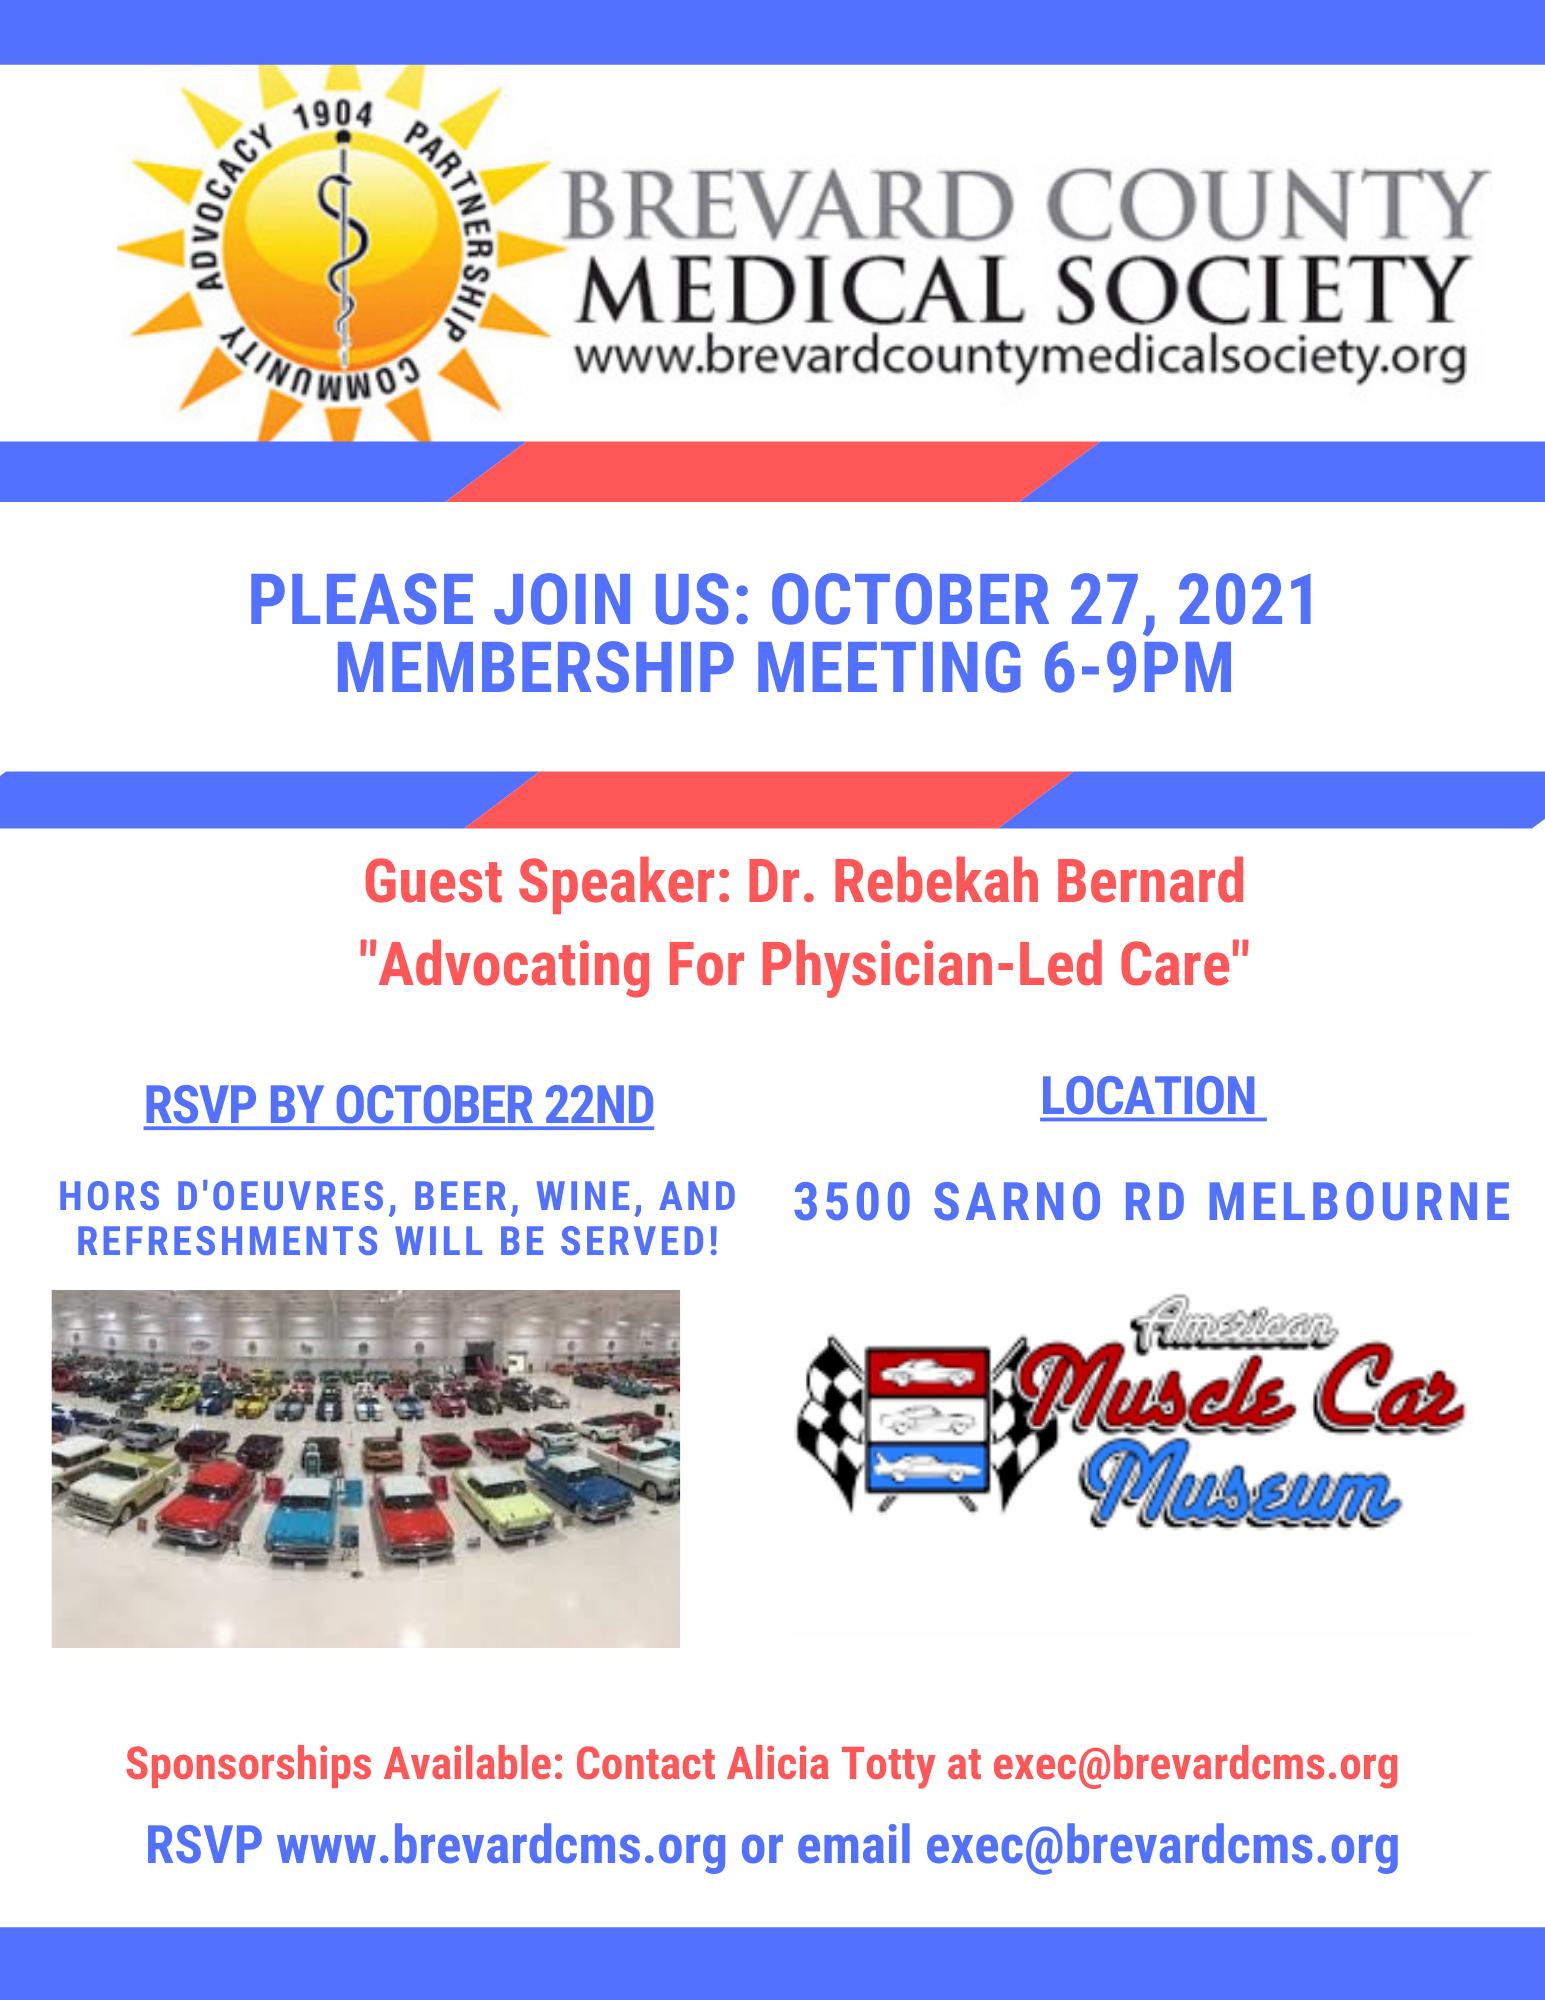 Brevard County Medical Society Meembership Meeting 2021 Muscle Car Museum